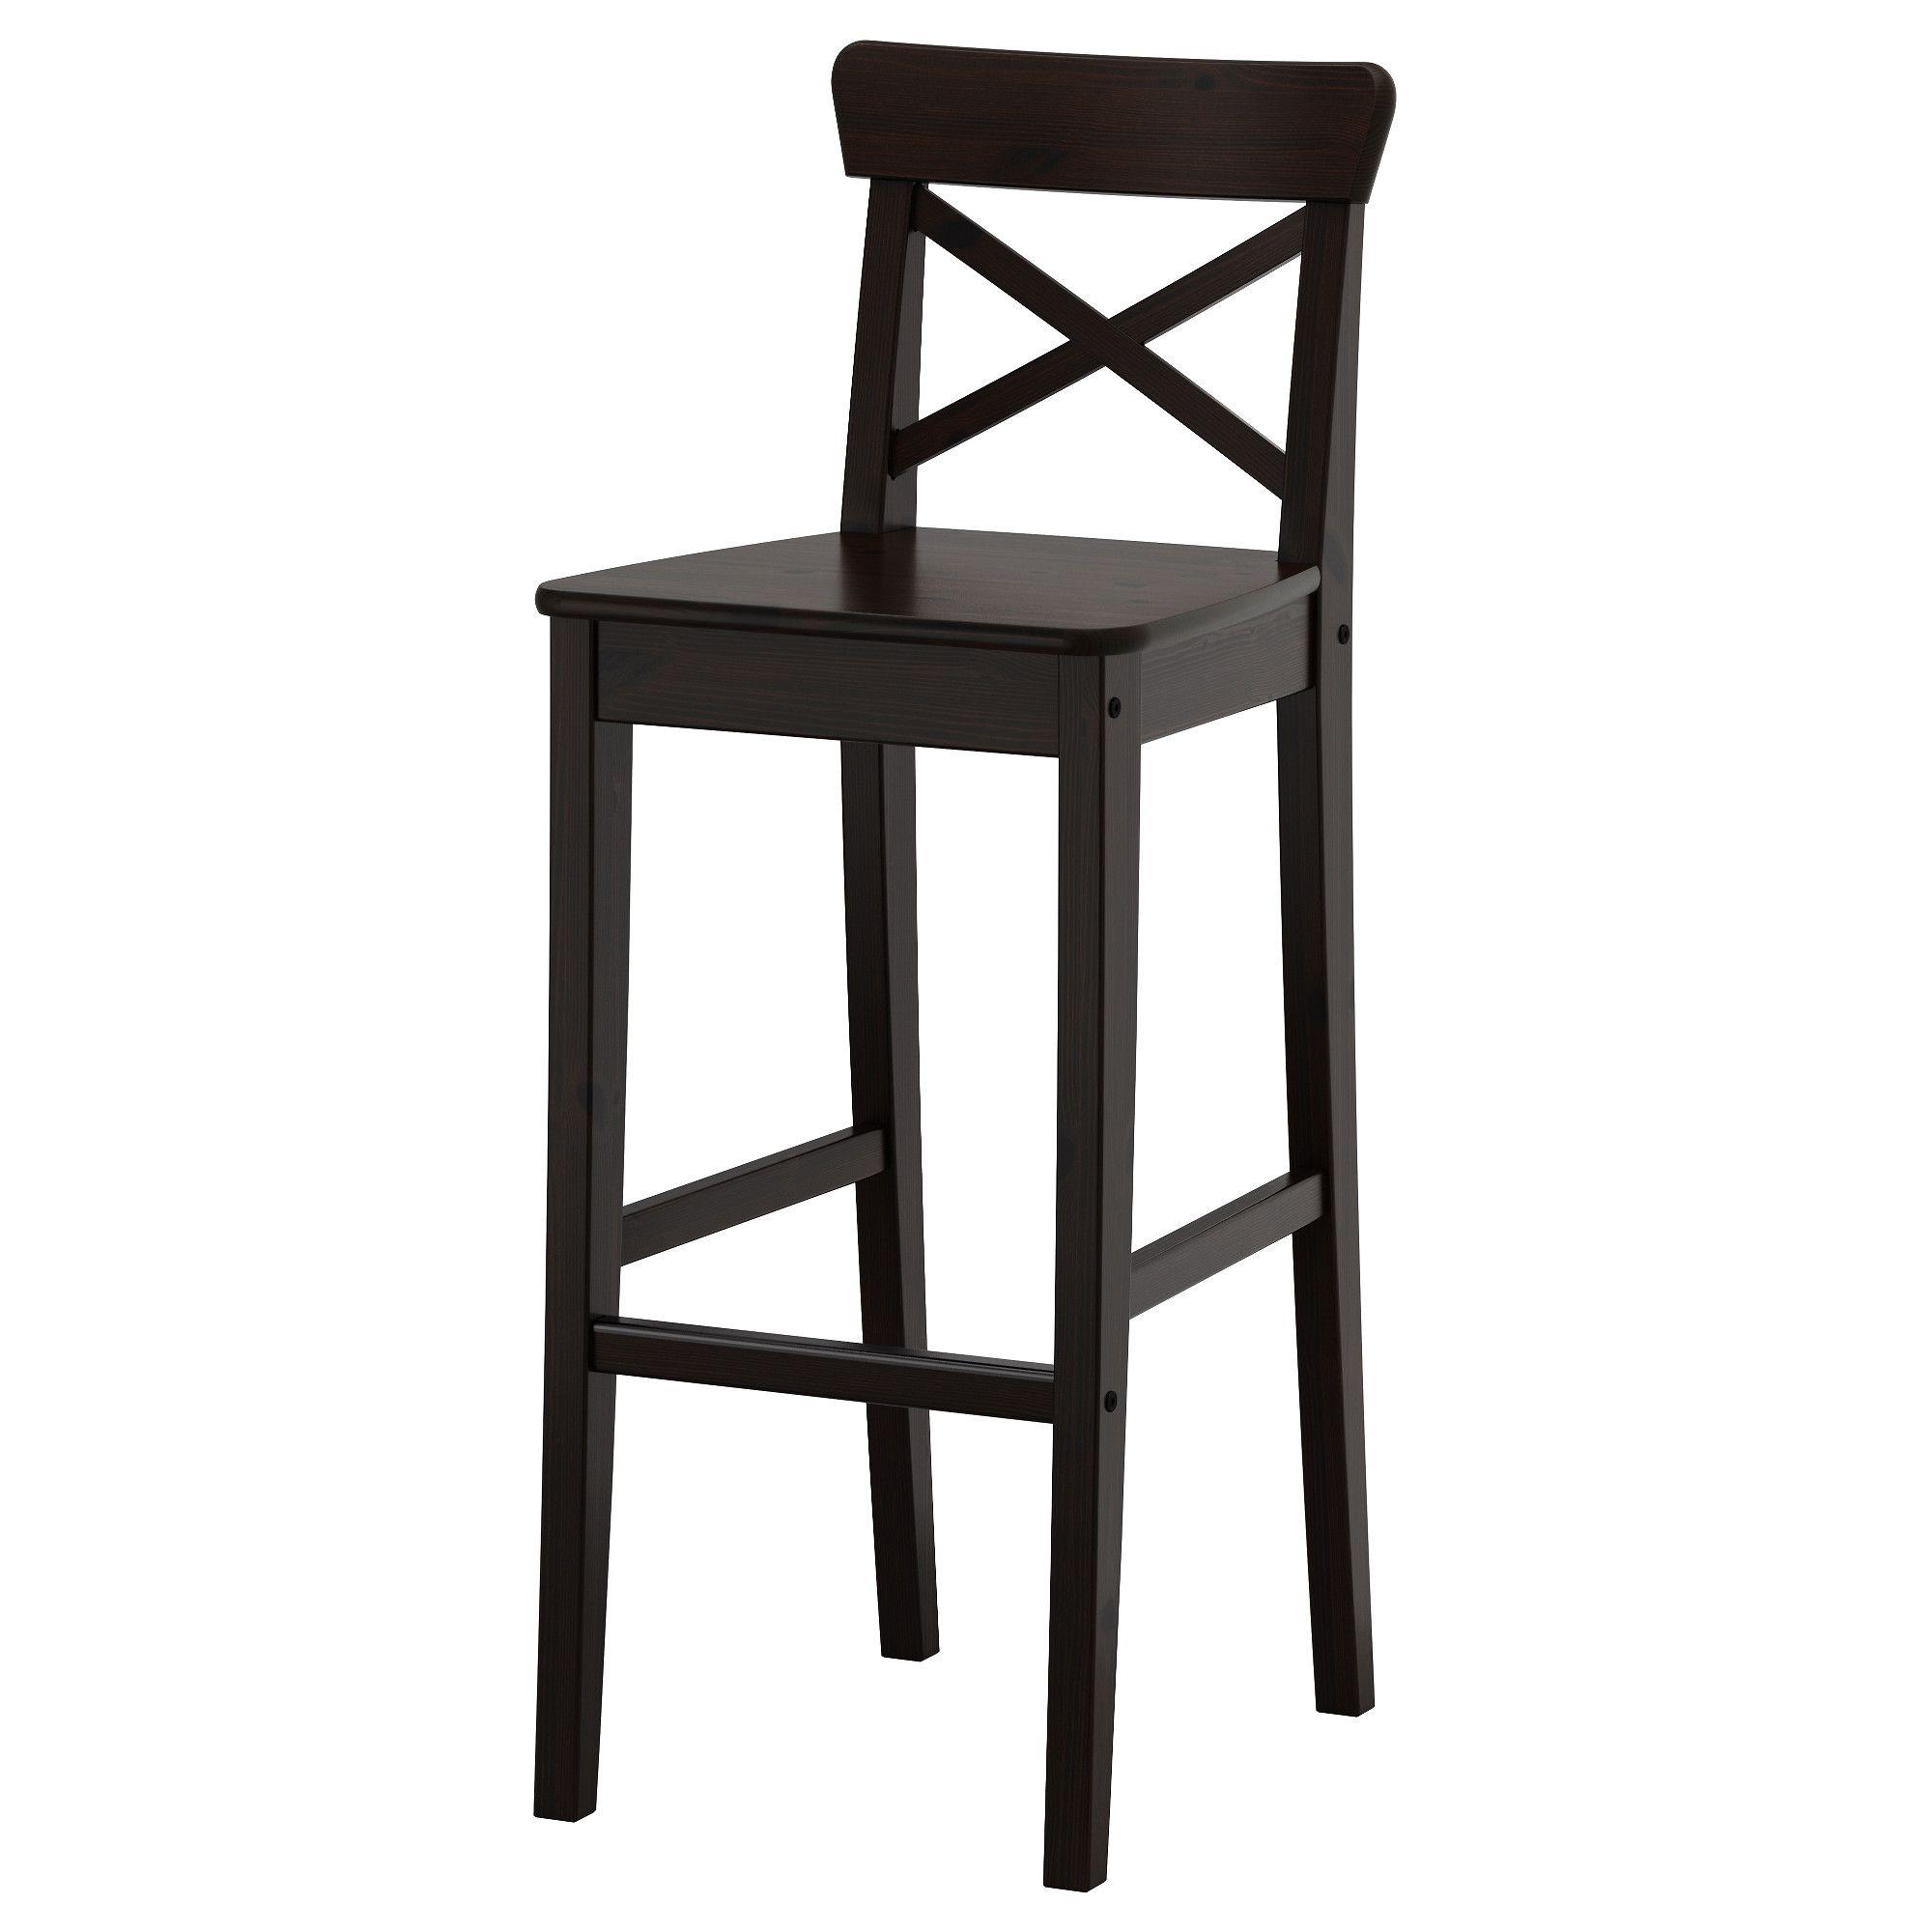 INGOLF Bar stool with backrest, brown-black - IKEA  Ikea